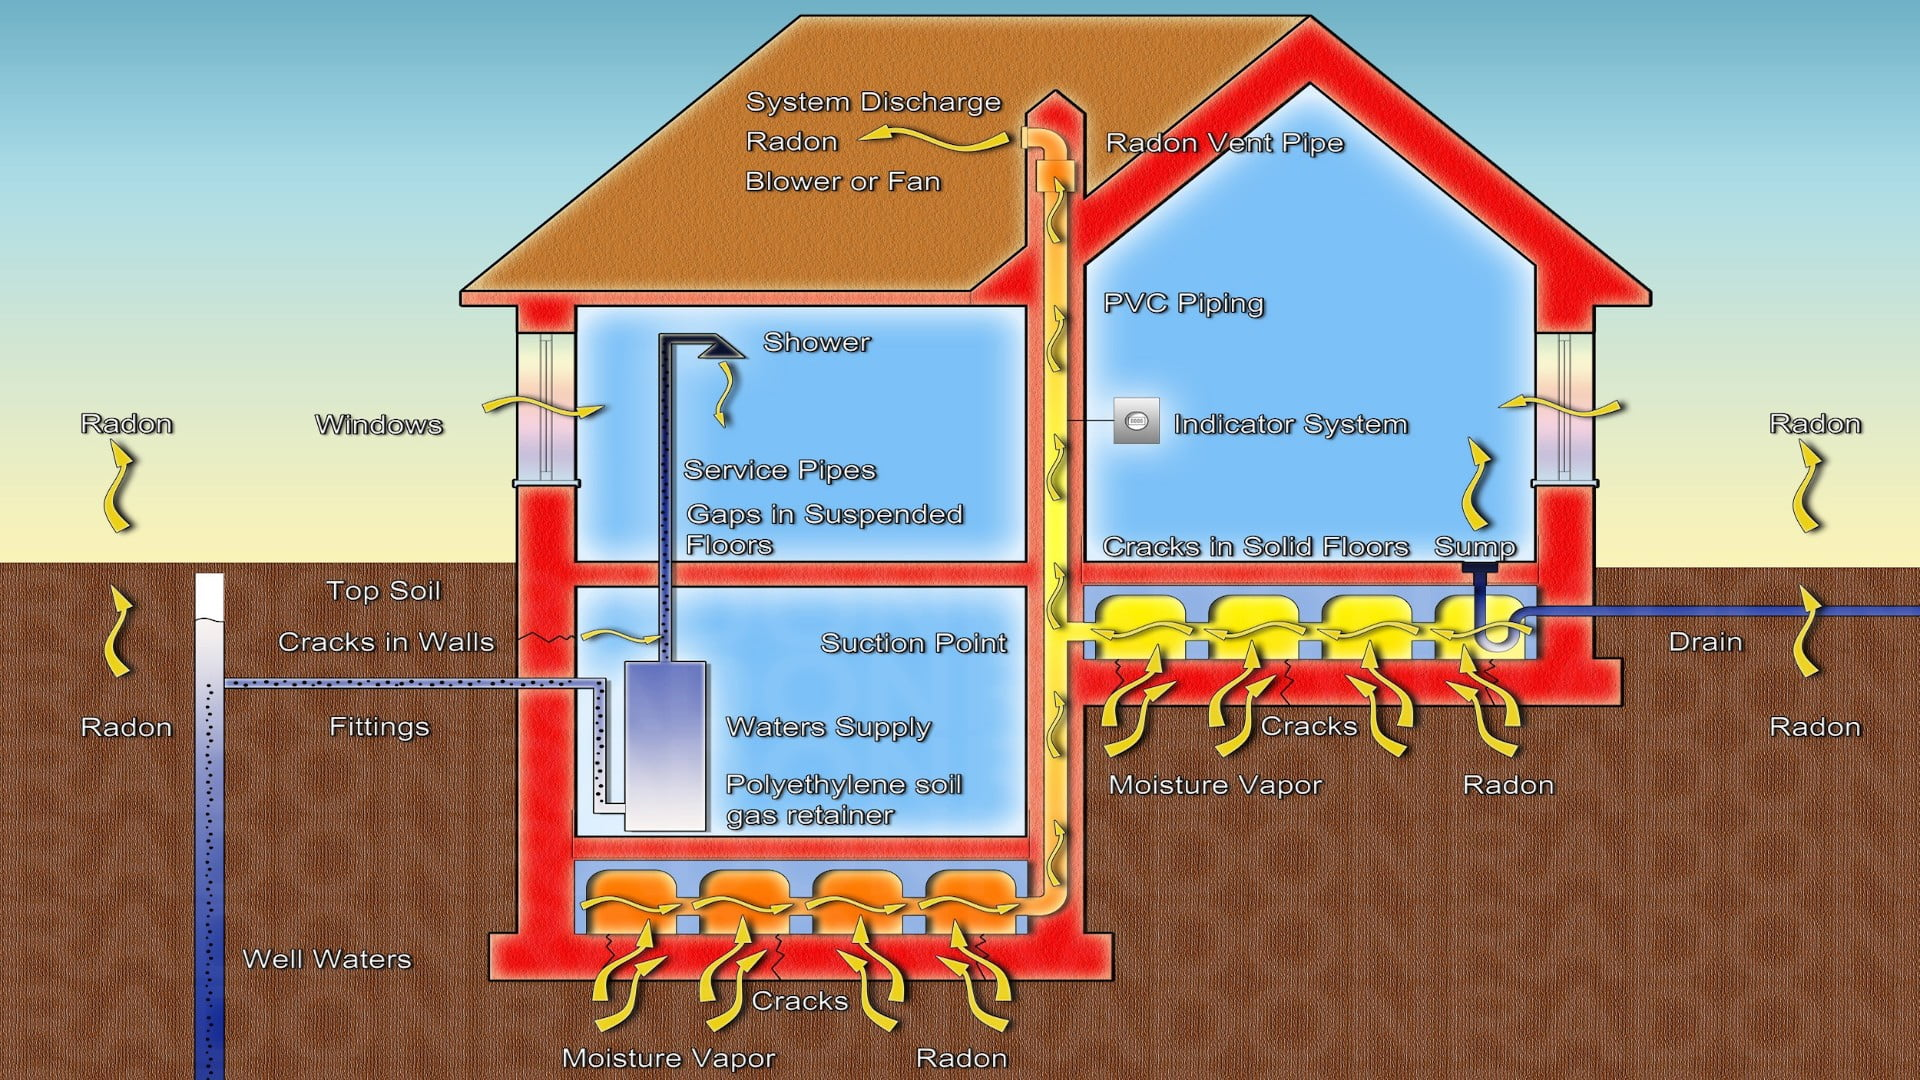 Radon illustration, How Radon Enters Your Home